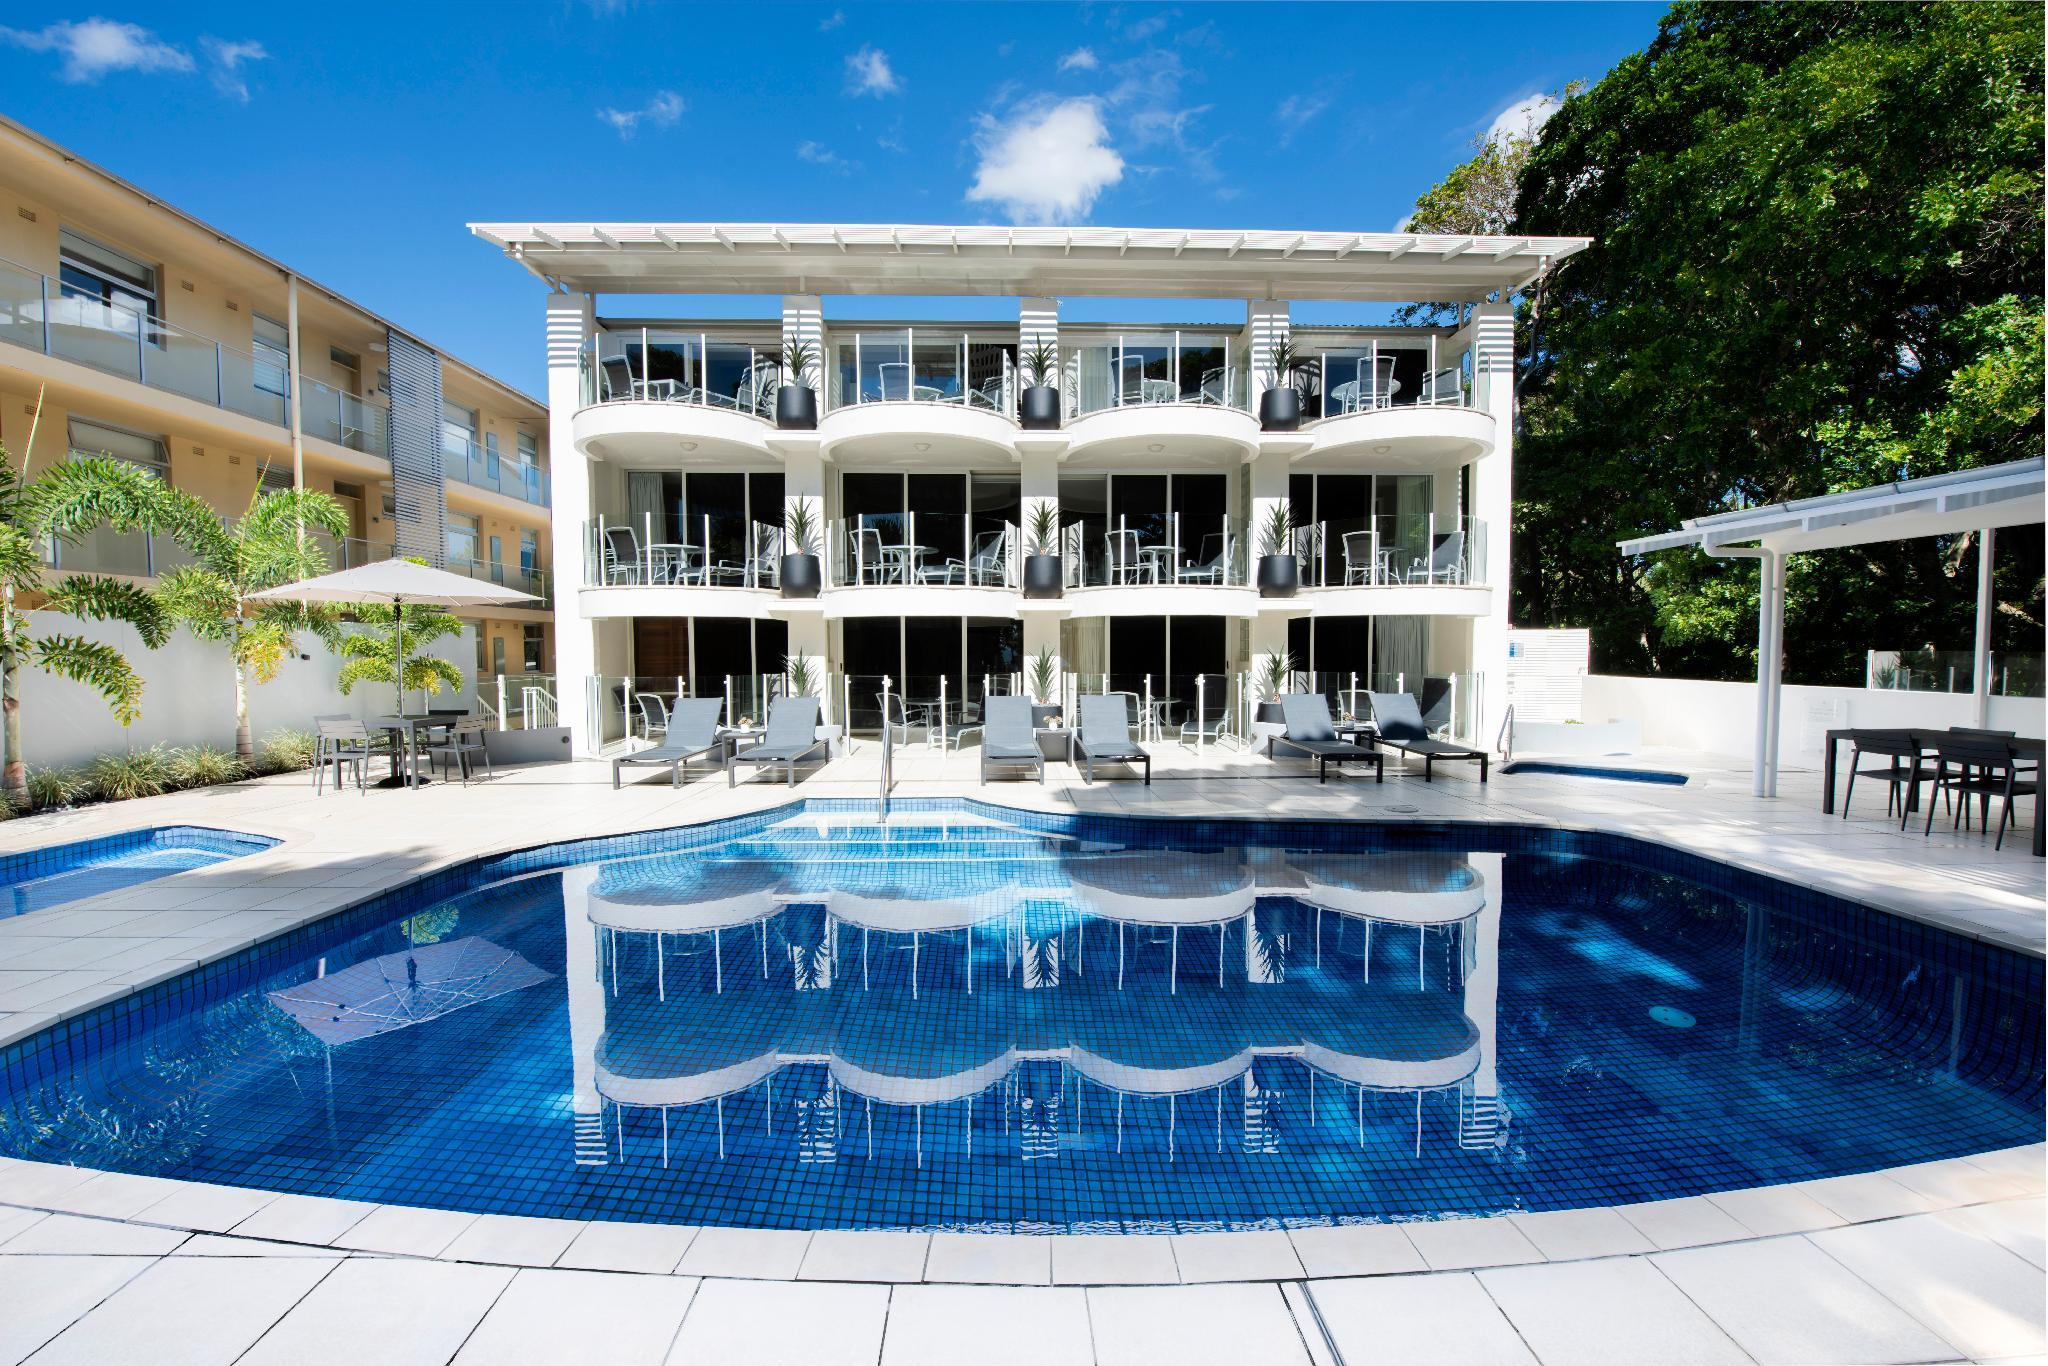 Sandcastles Hotel Noosa